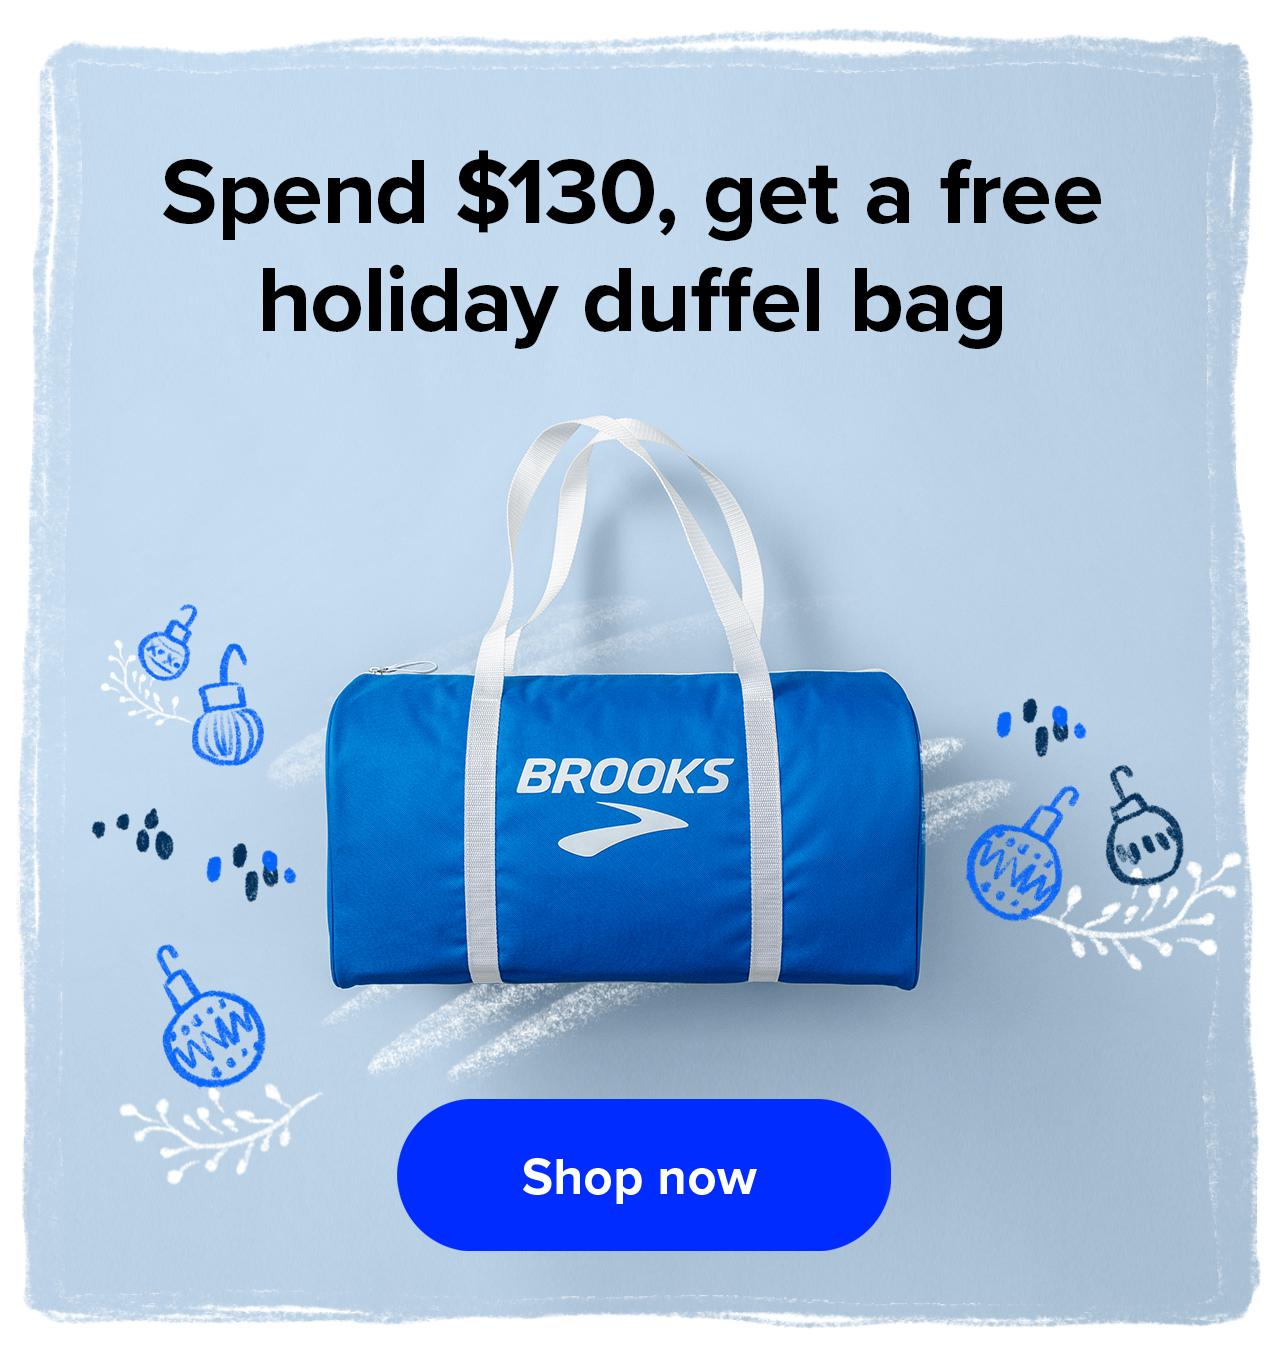 Spend $130, get a free duffel bag.   Shop now